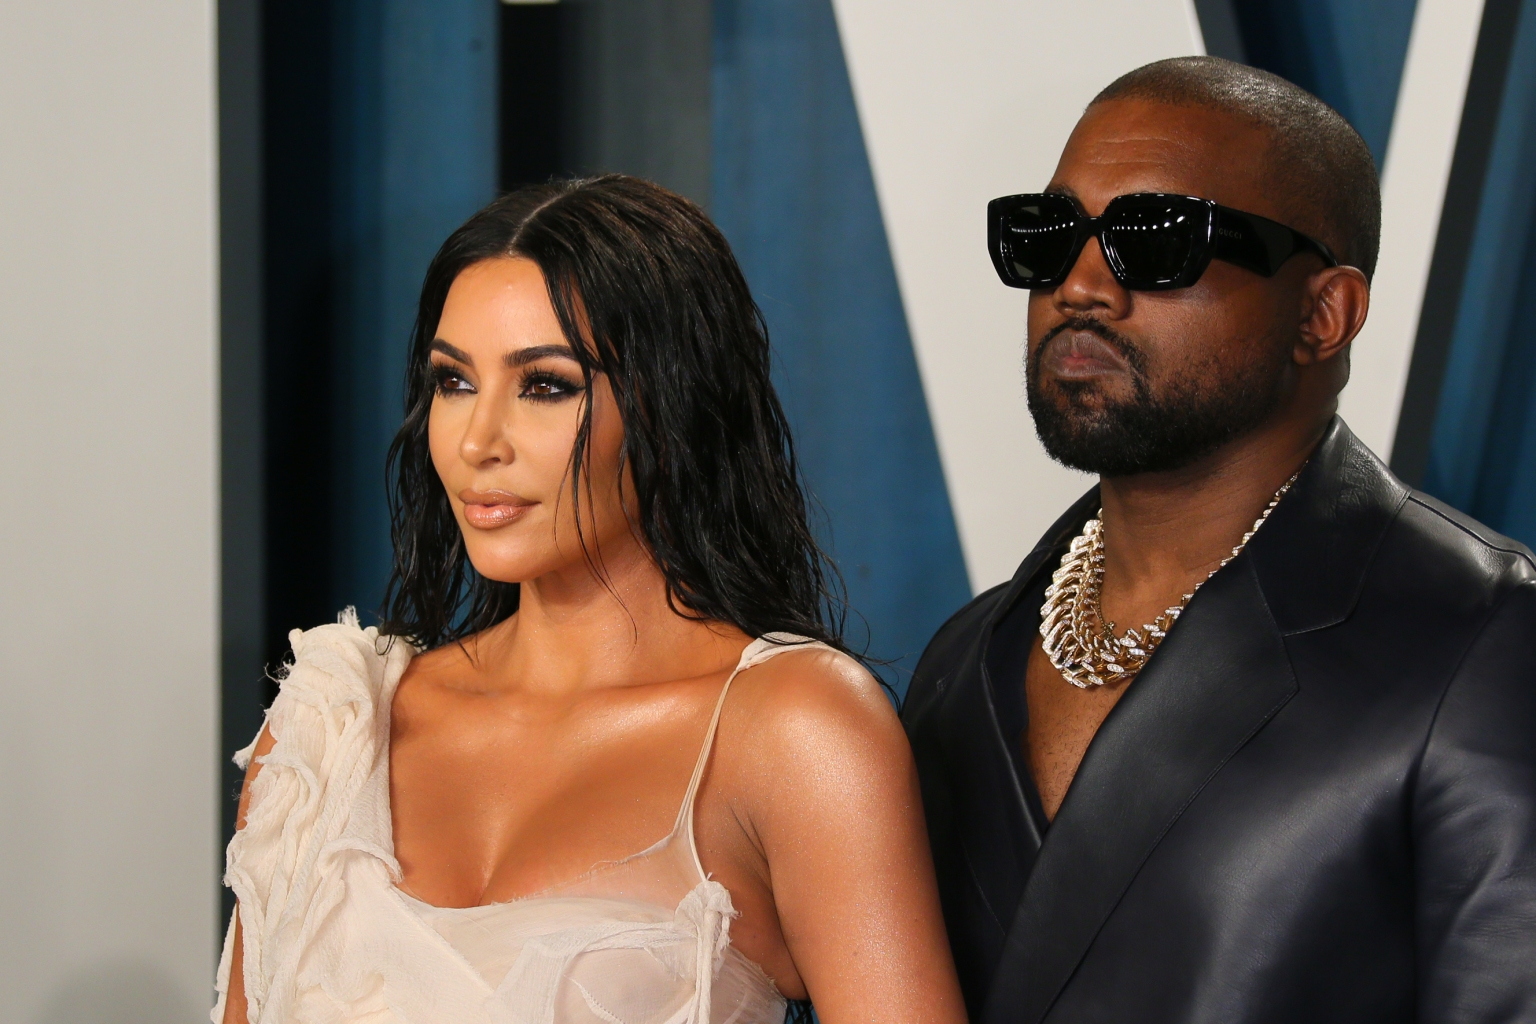 Report: Kim Kardashian files for divorce from Kanye West